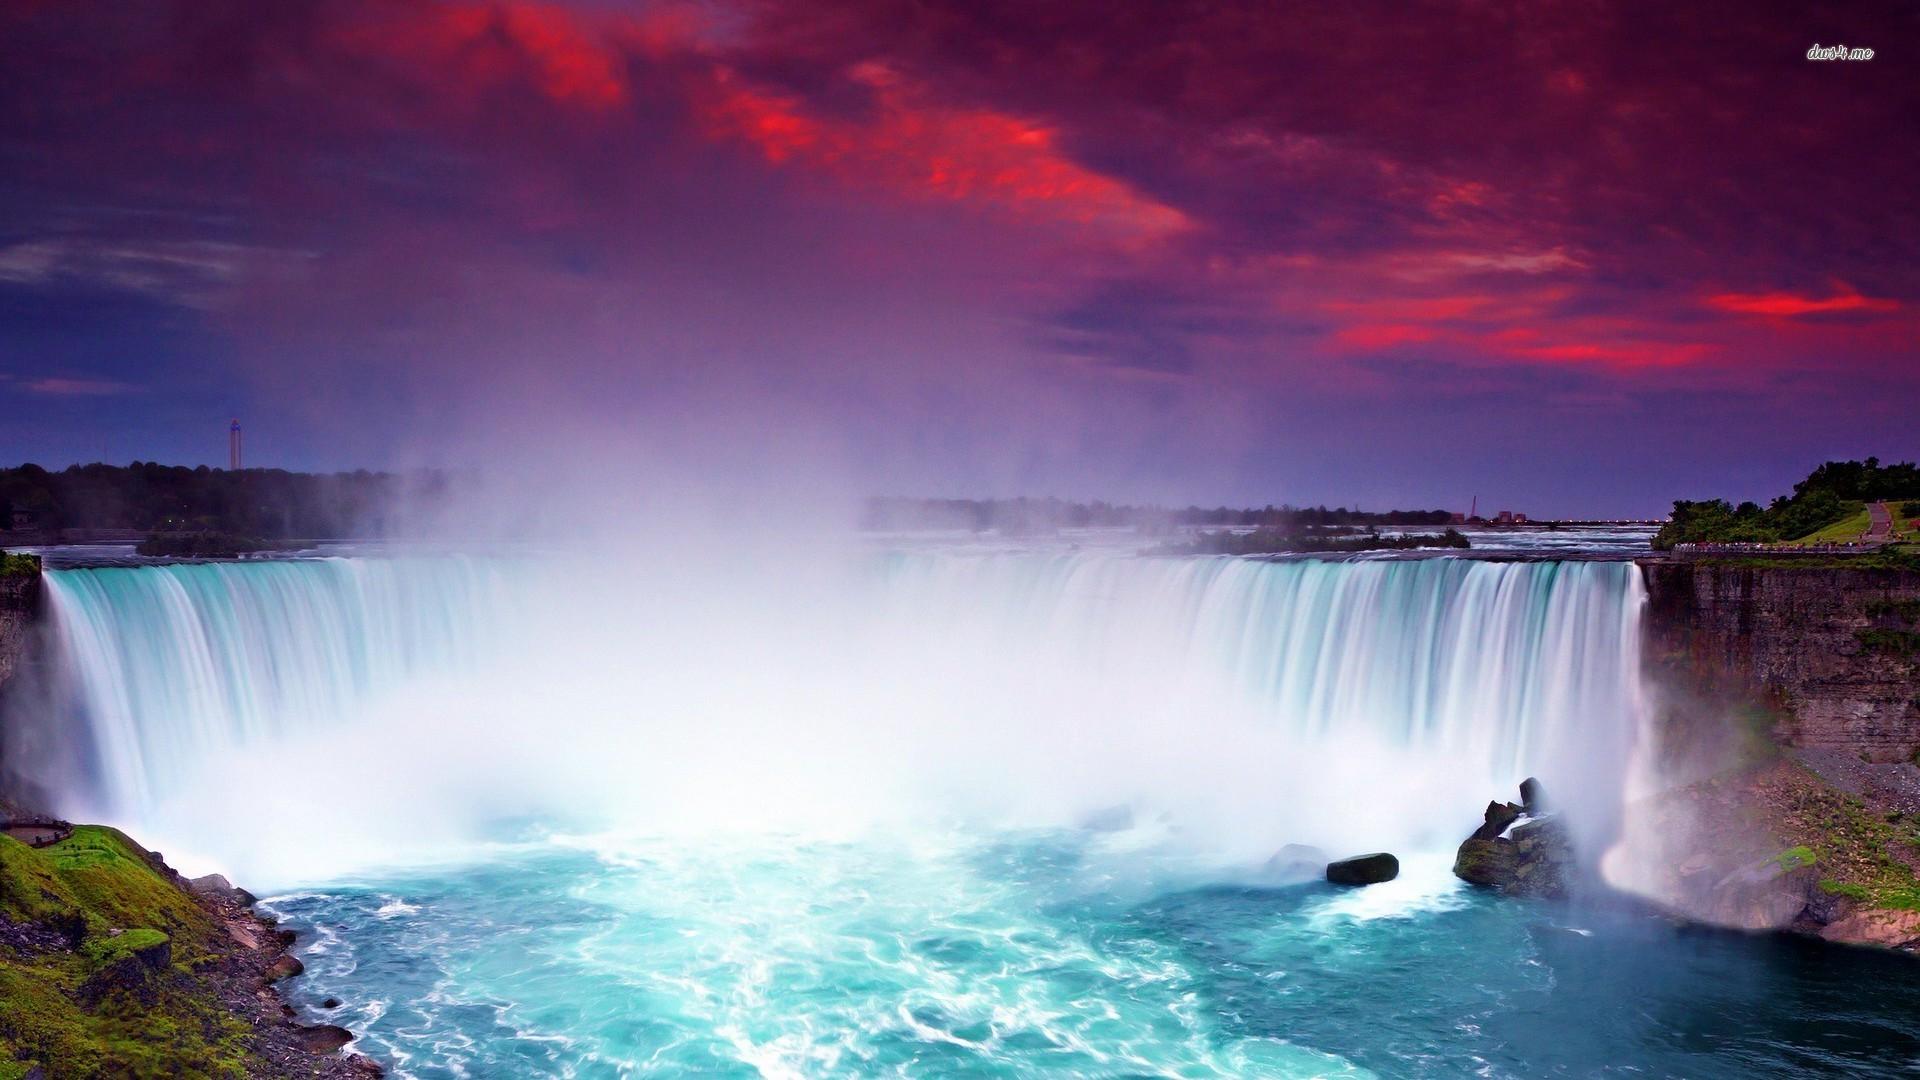 Niagara Falls Wallpaper HD HD Wallpapers High Definition High Definition